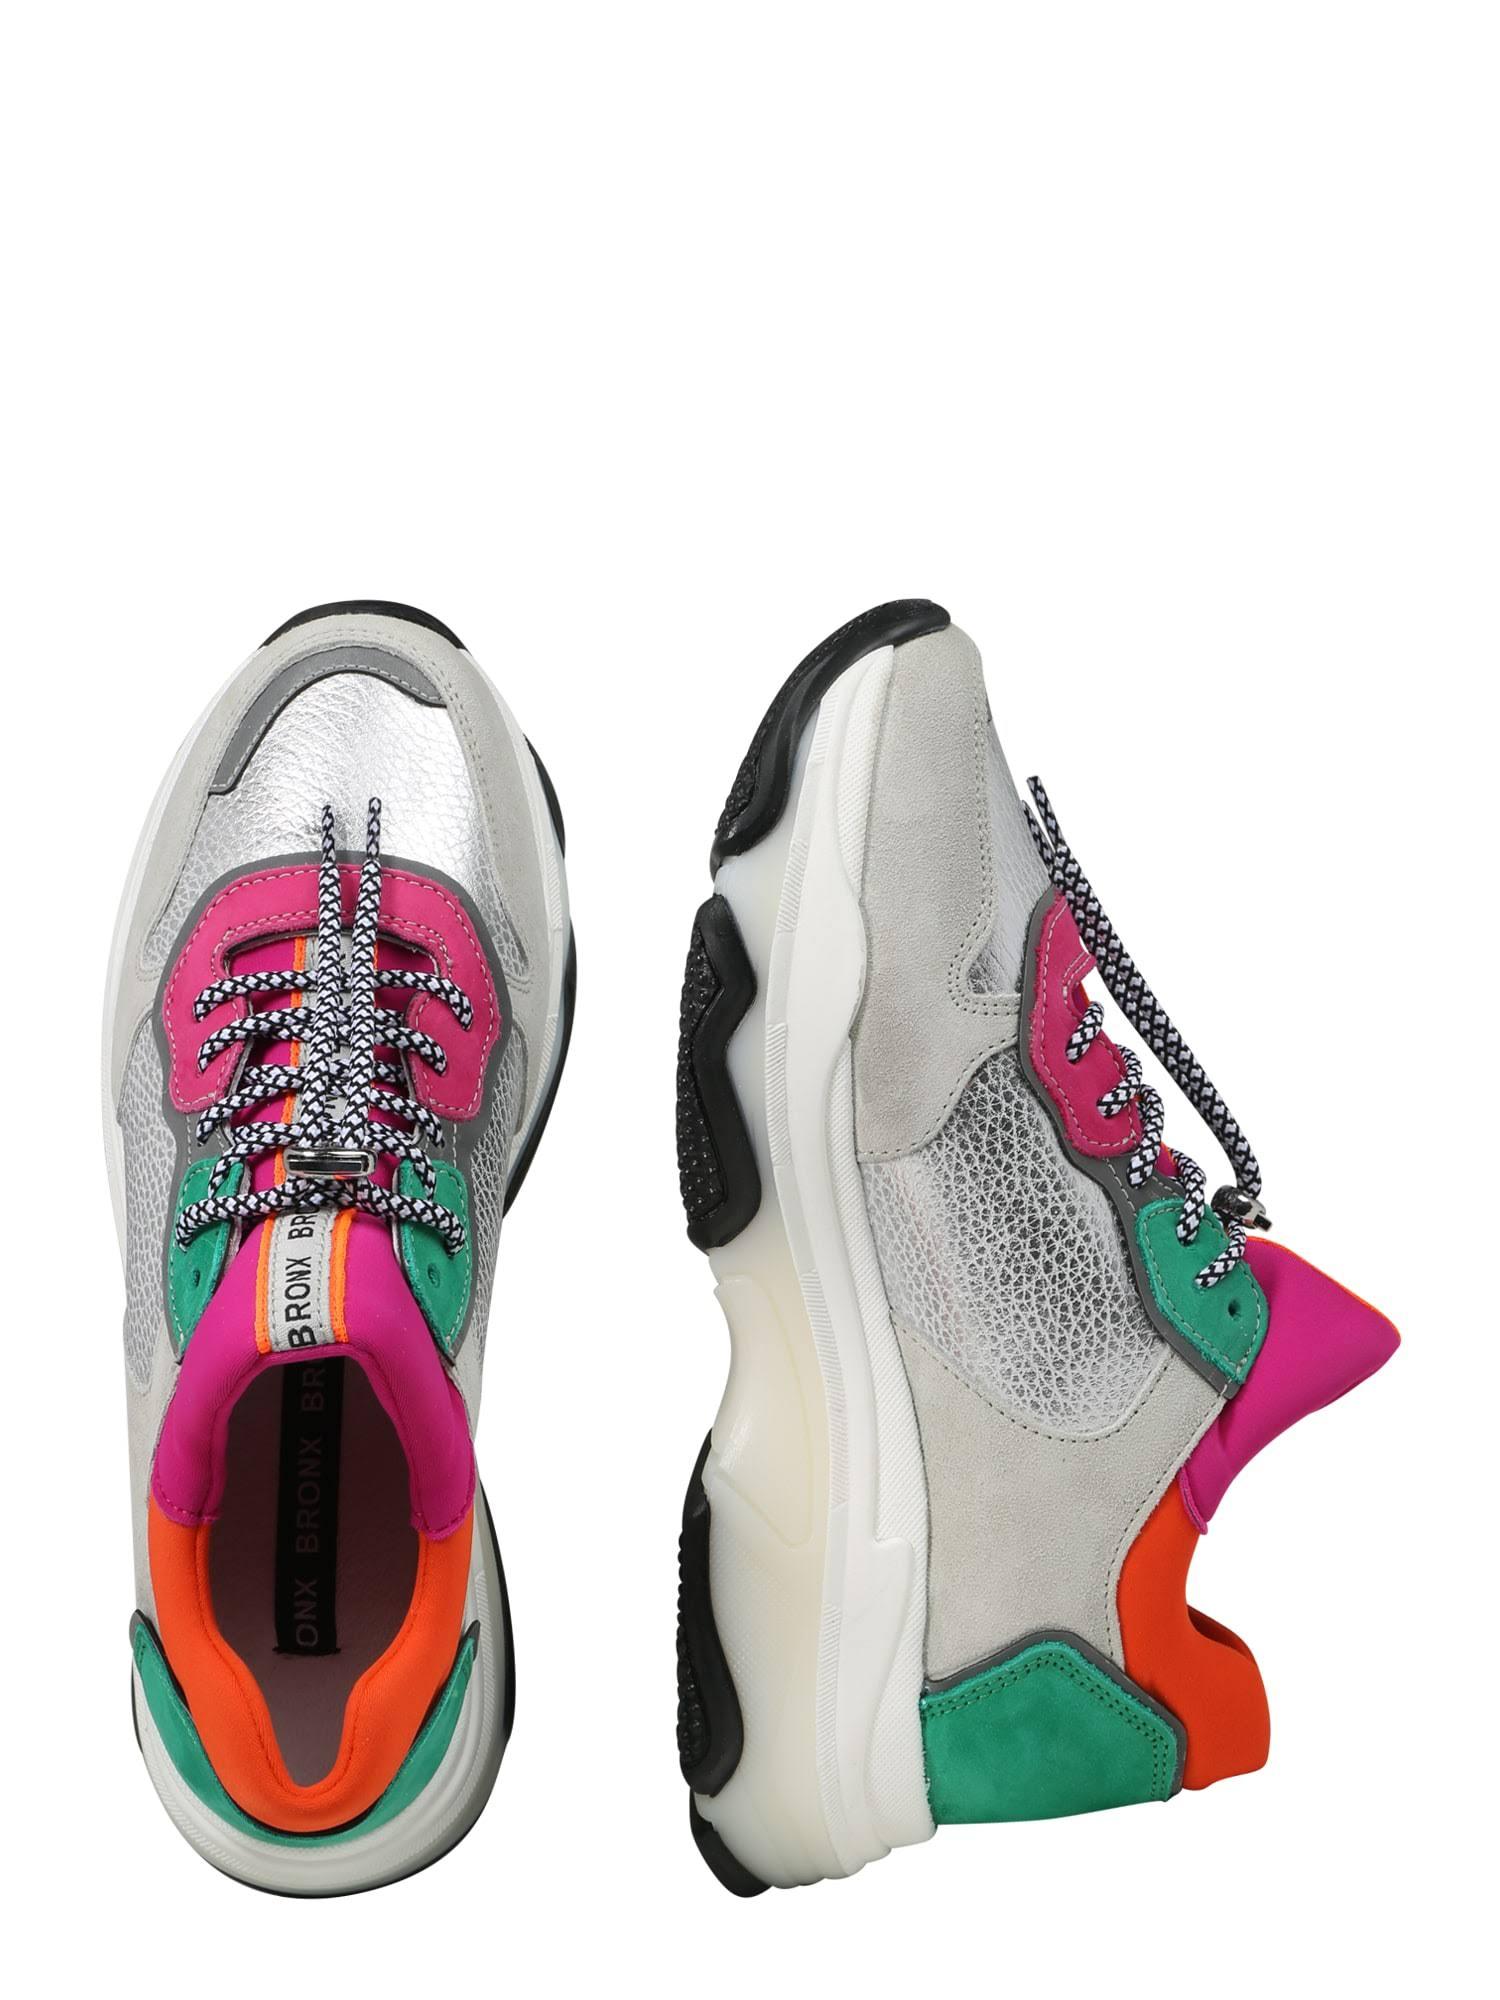 Baisley Textiel Sneakers fuchsiaDamesMaat39LichtgrijsLeer Offwhite silver Laag En Bronx qSzpGULMjV